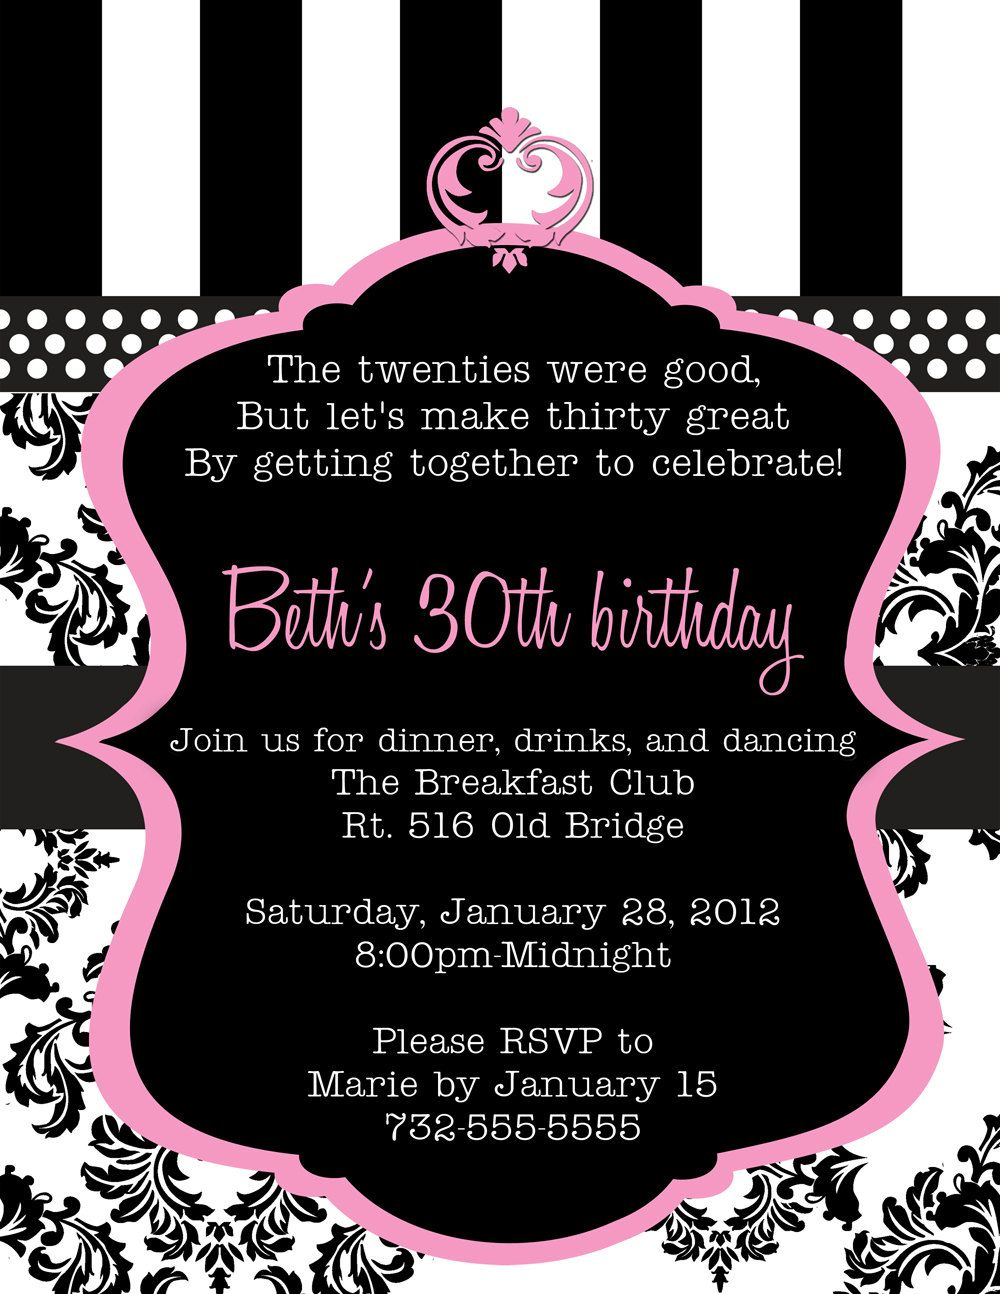 birthday-invitations-incredible-sweet-30th-birthday-invitations-free ...